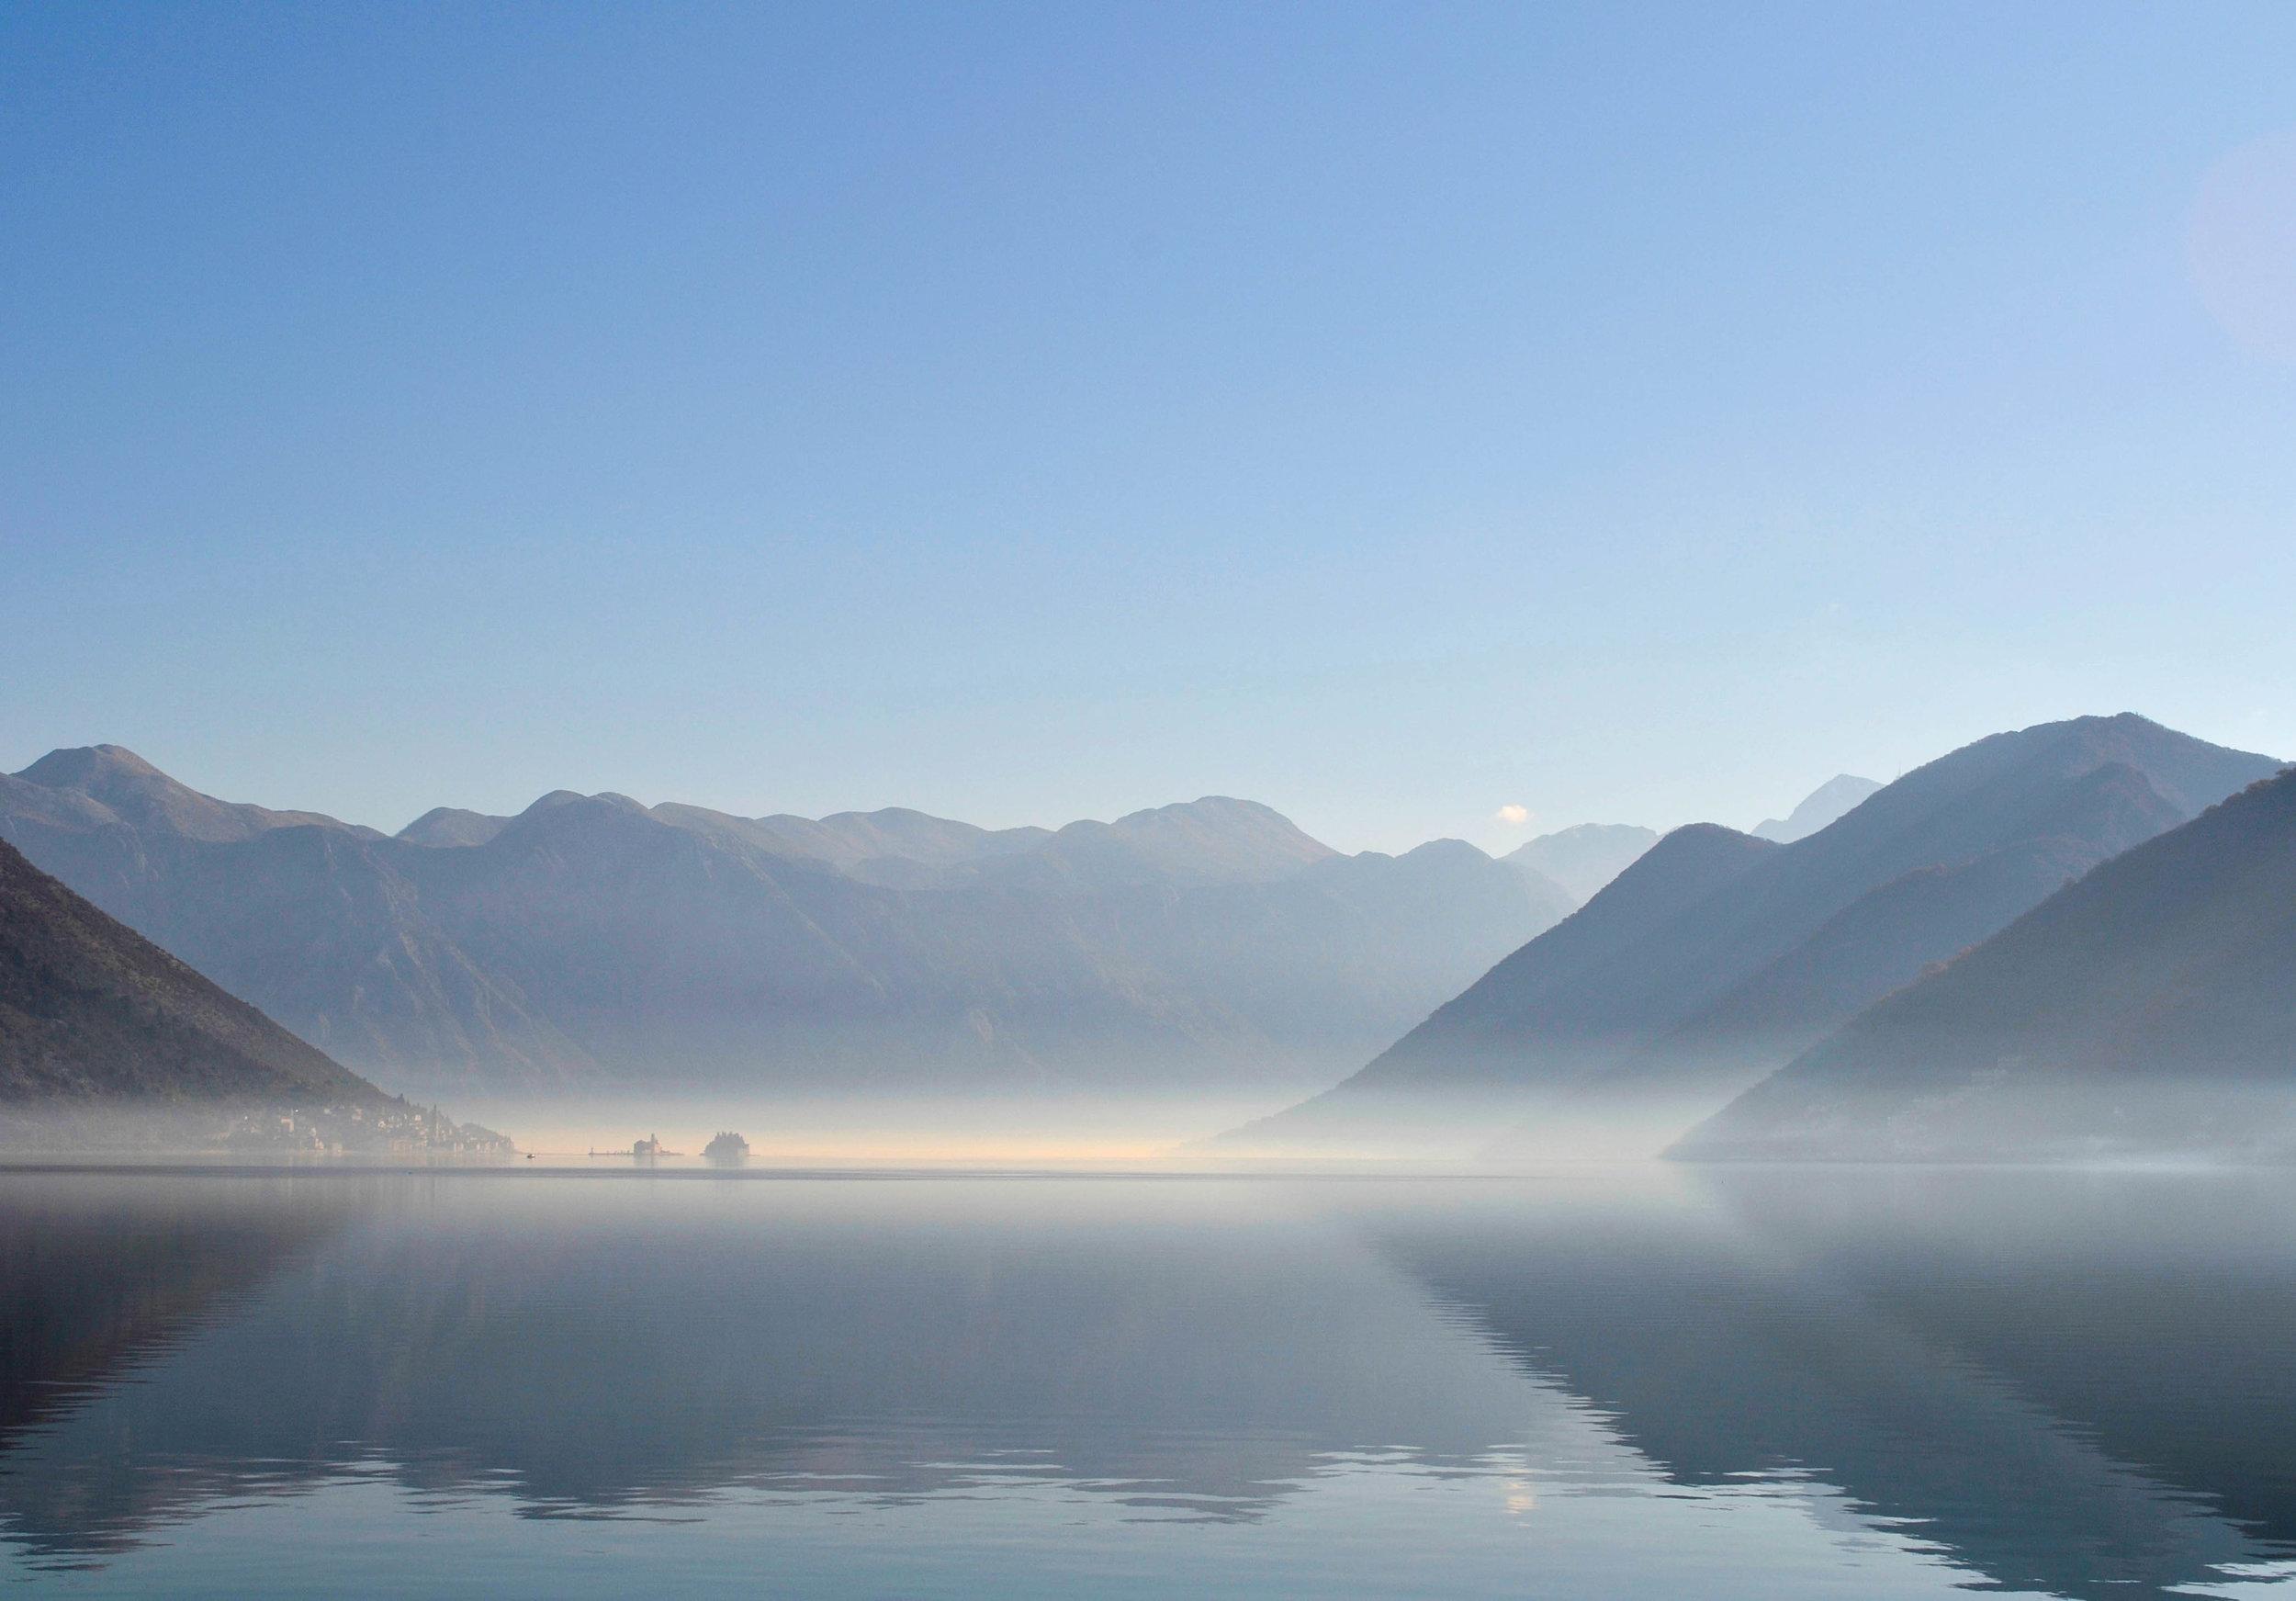 View of Perast, Montenegro